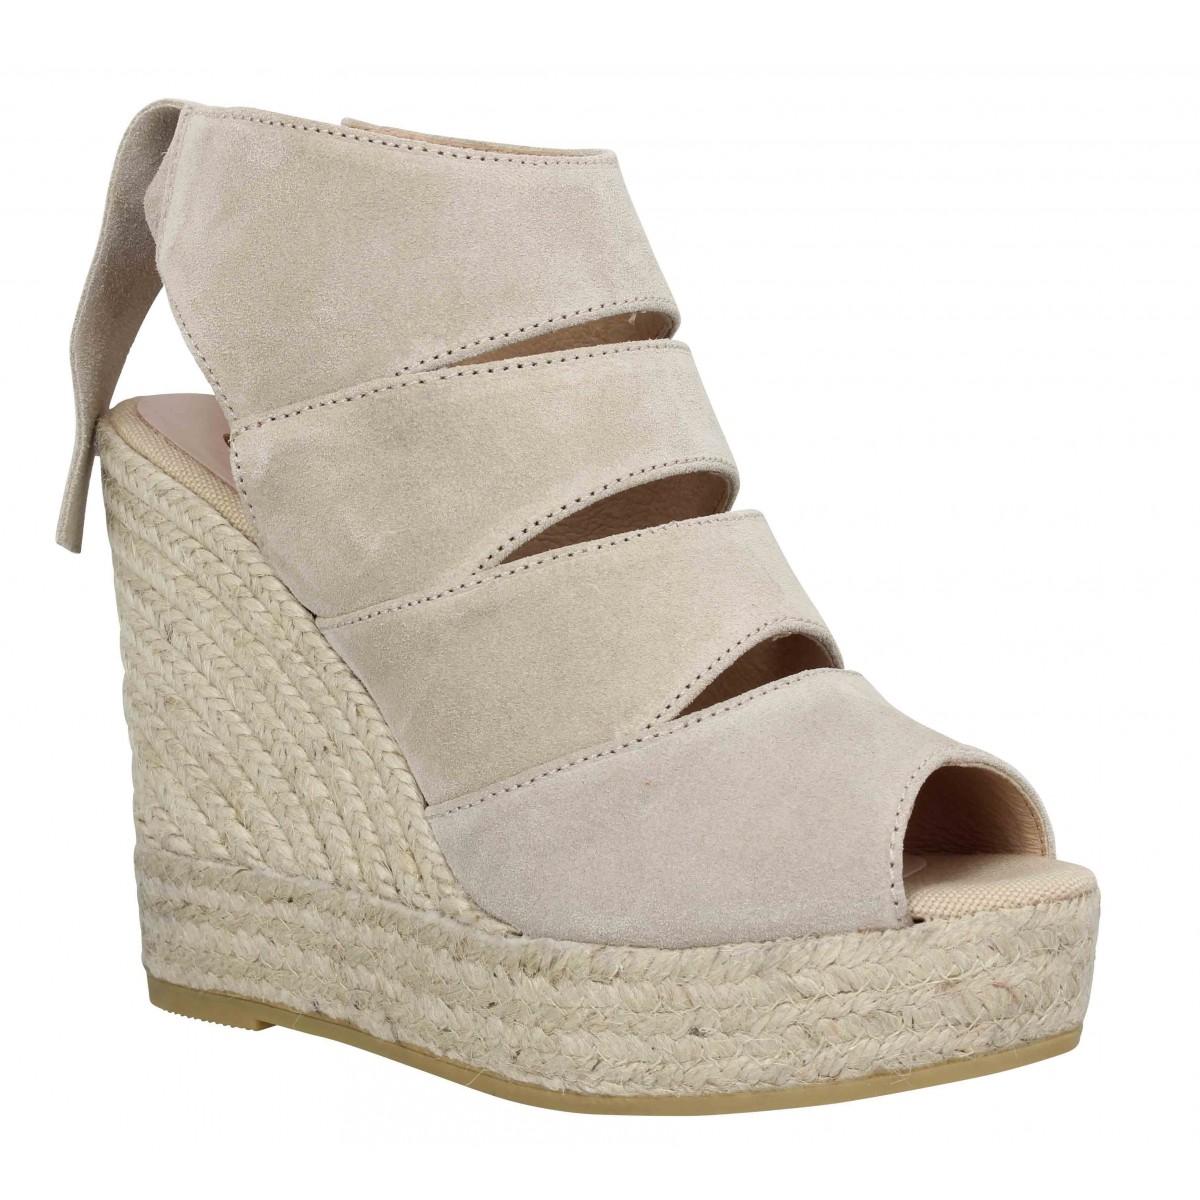 Sandales talons KANNA 8141 velours Femme Beige